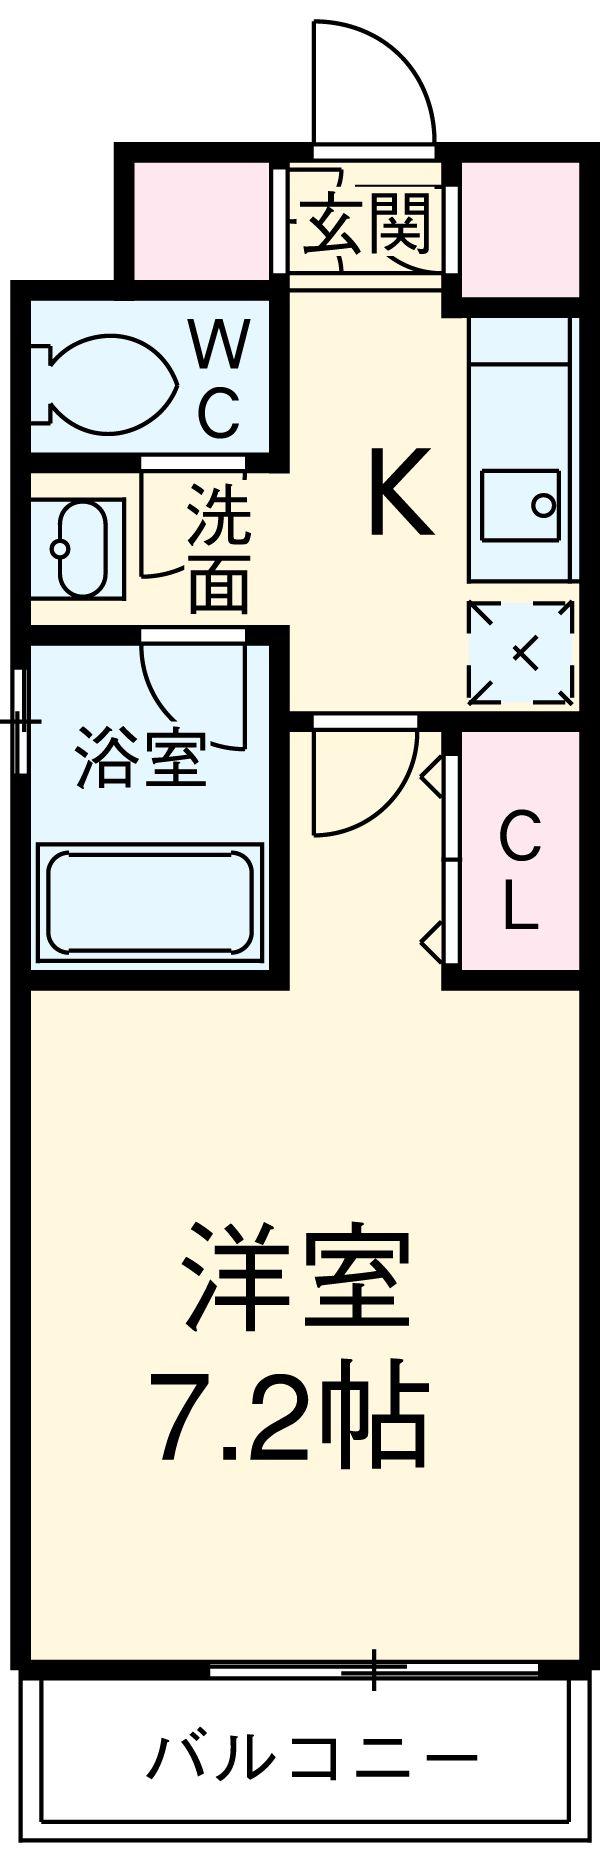 HF駒沢公園レジデンスTOWER 612号室の間取り